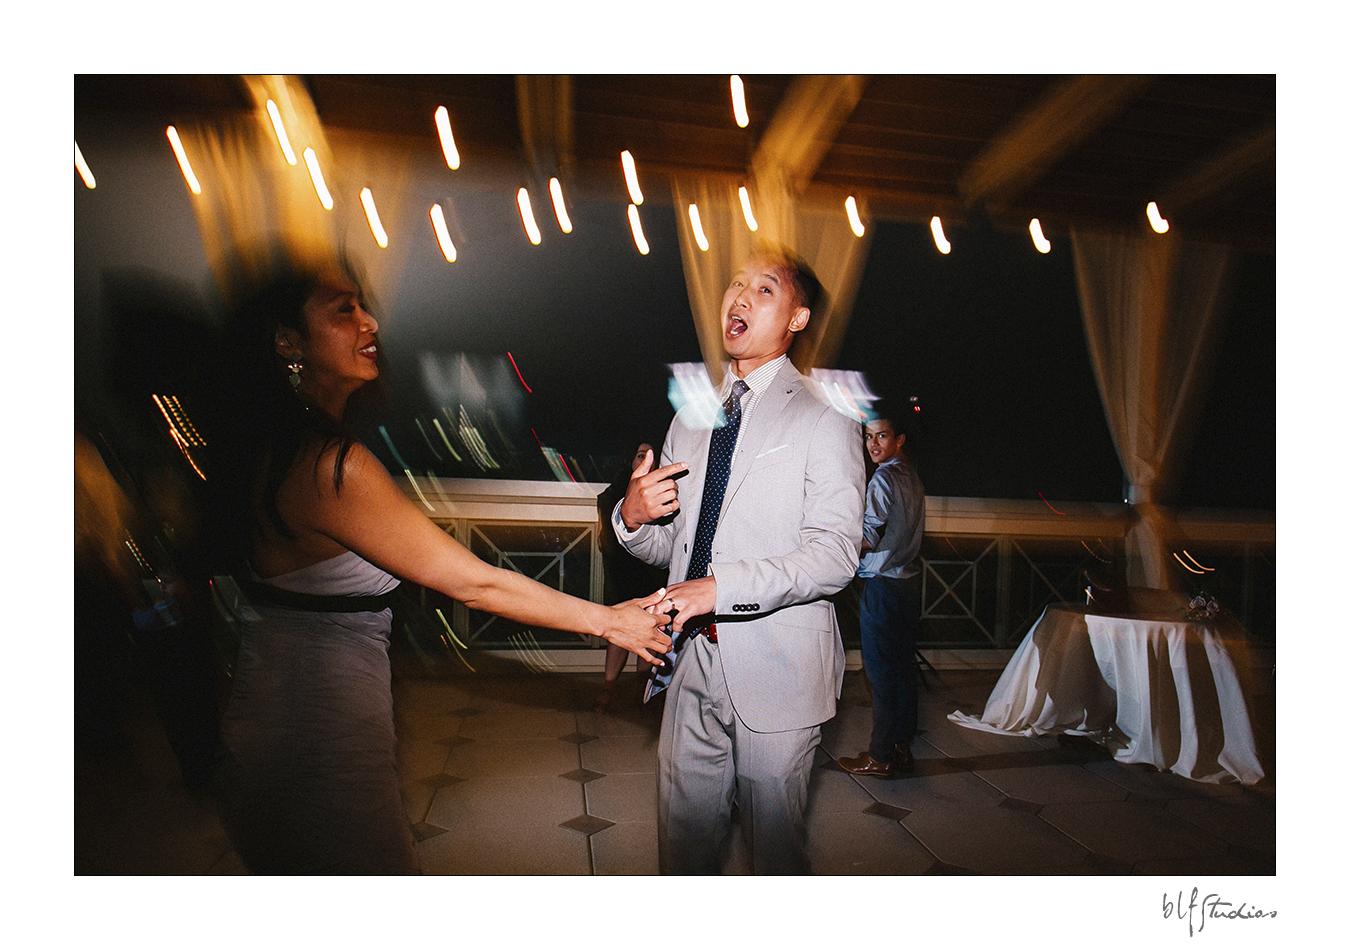 0047-blfstudios-wedding-photographer-daniel-danielle-atlanta.jpg